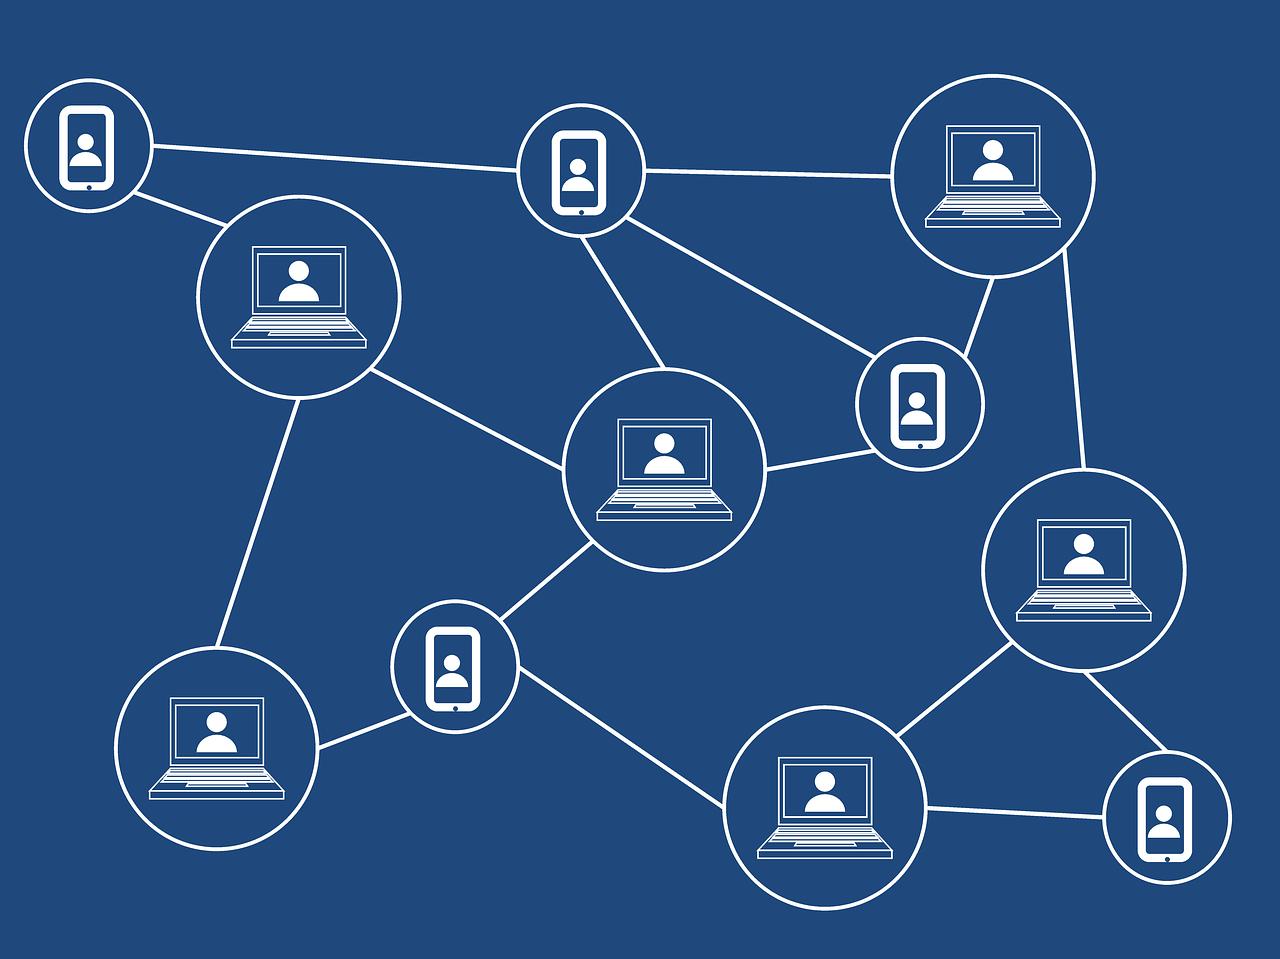 Blockchain Block Chain - Free image on Pixabay